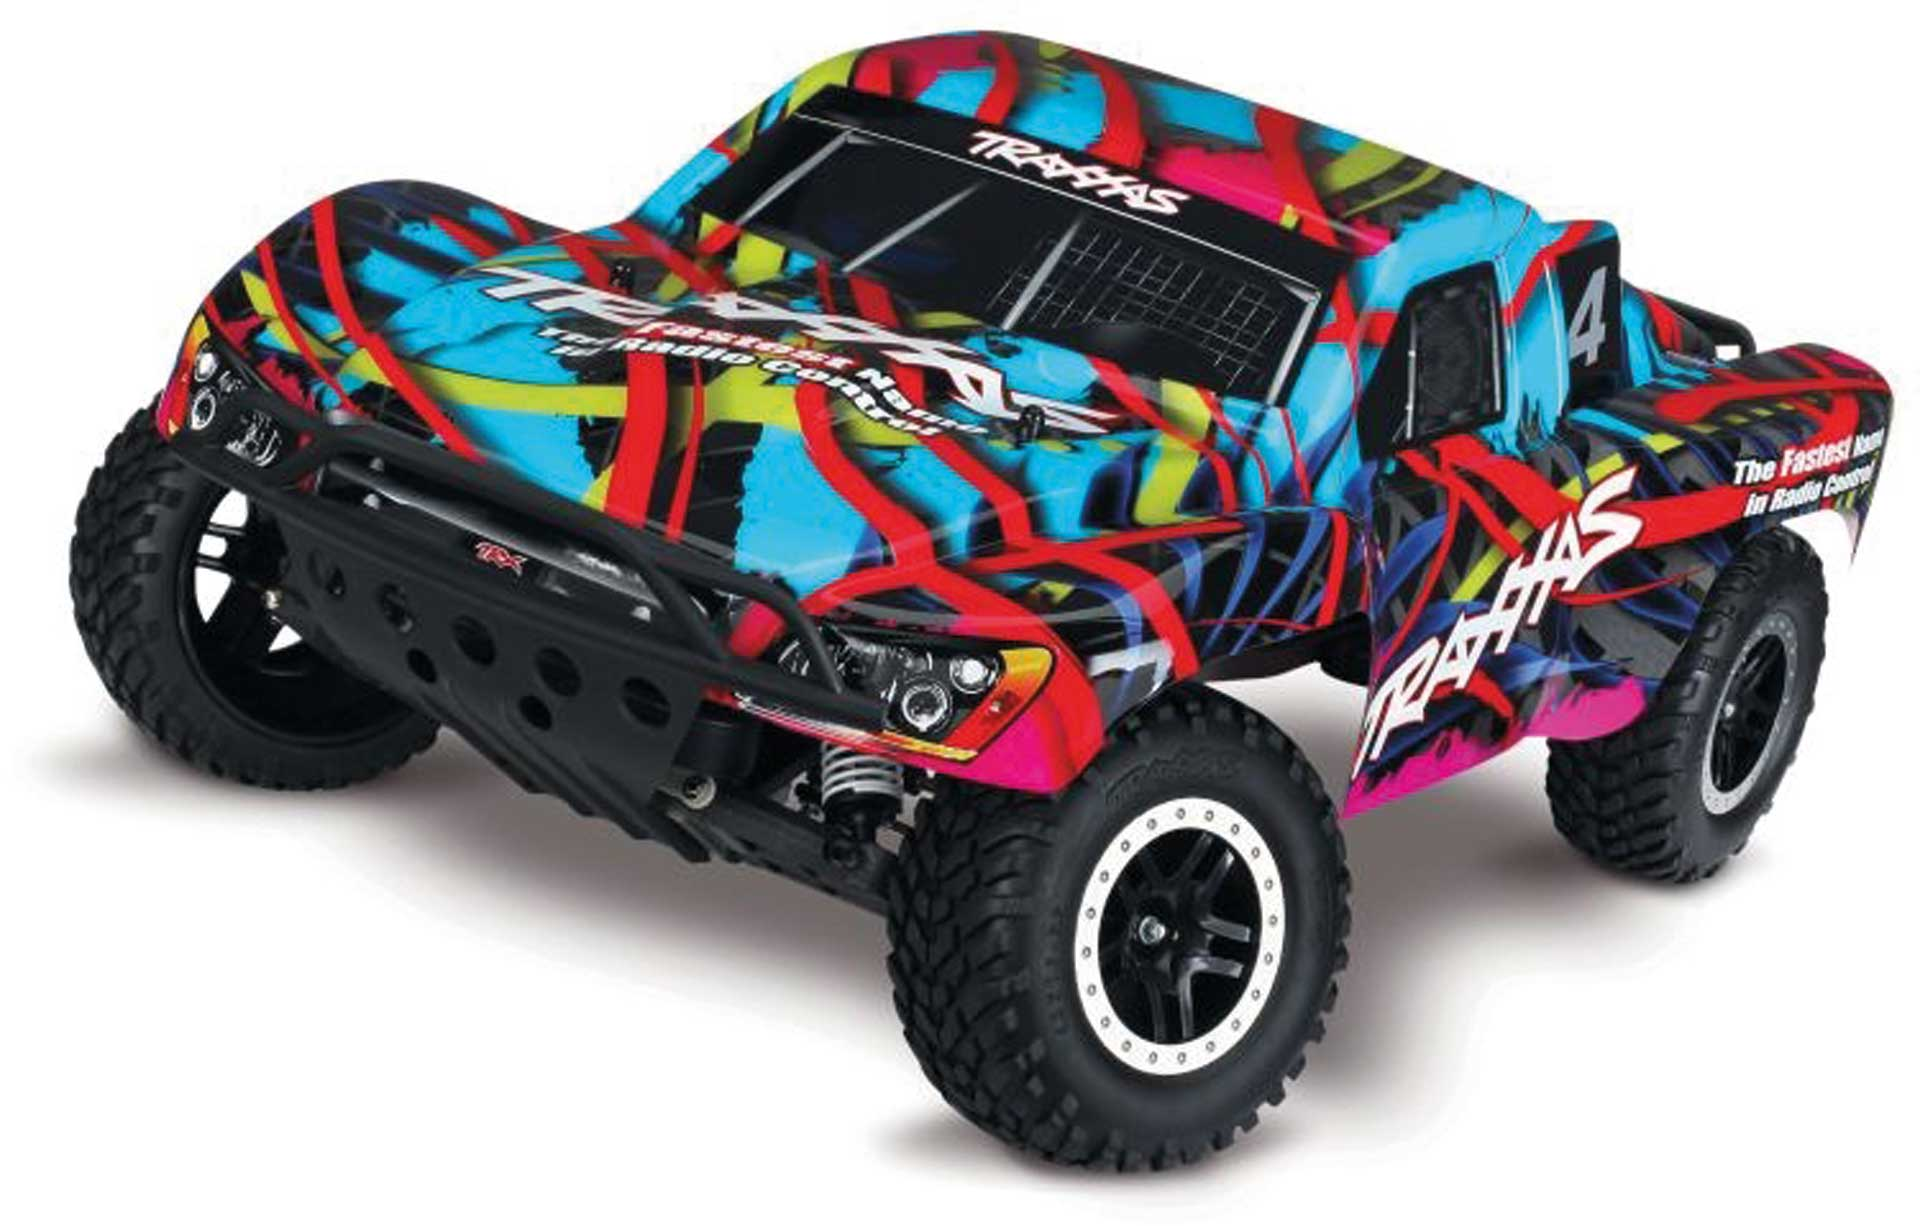 Traxxas SLASH HAWAIIAN RTR +12V-LADER+AKKU 1/10 2WD SHORT COURSE RACING TRUCK BRUSHED